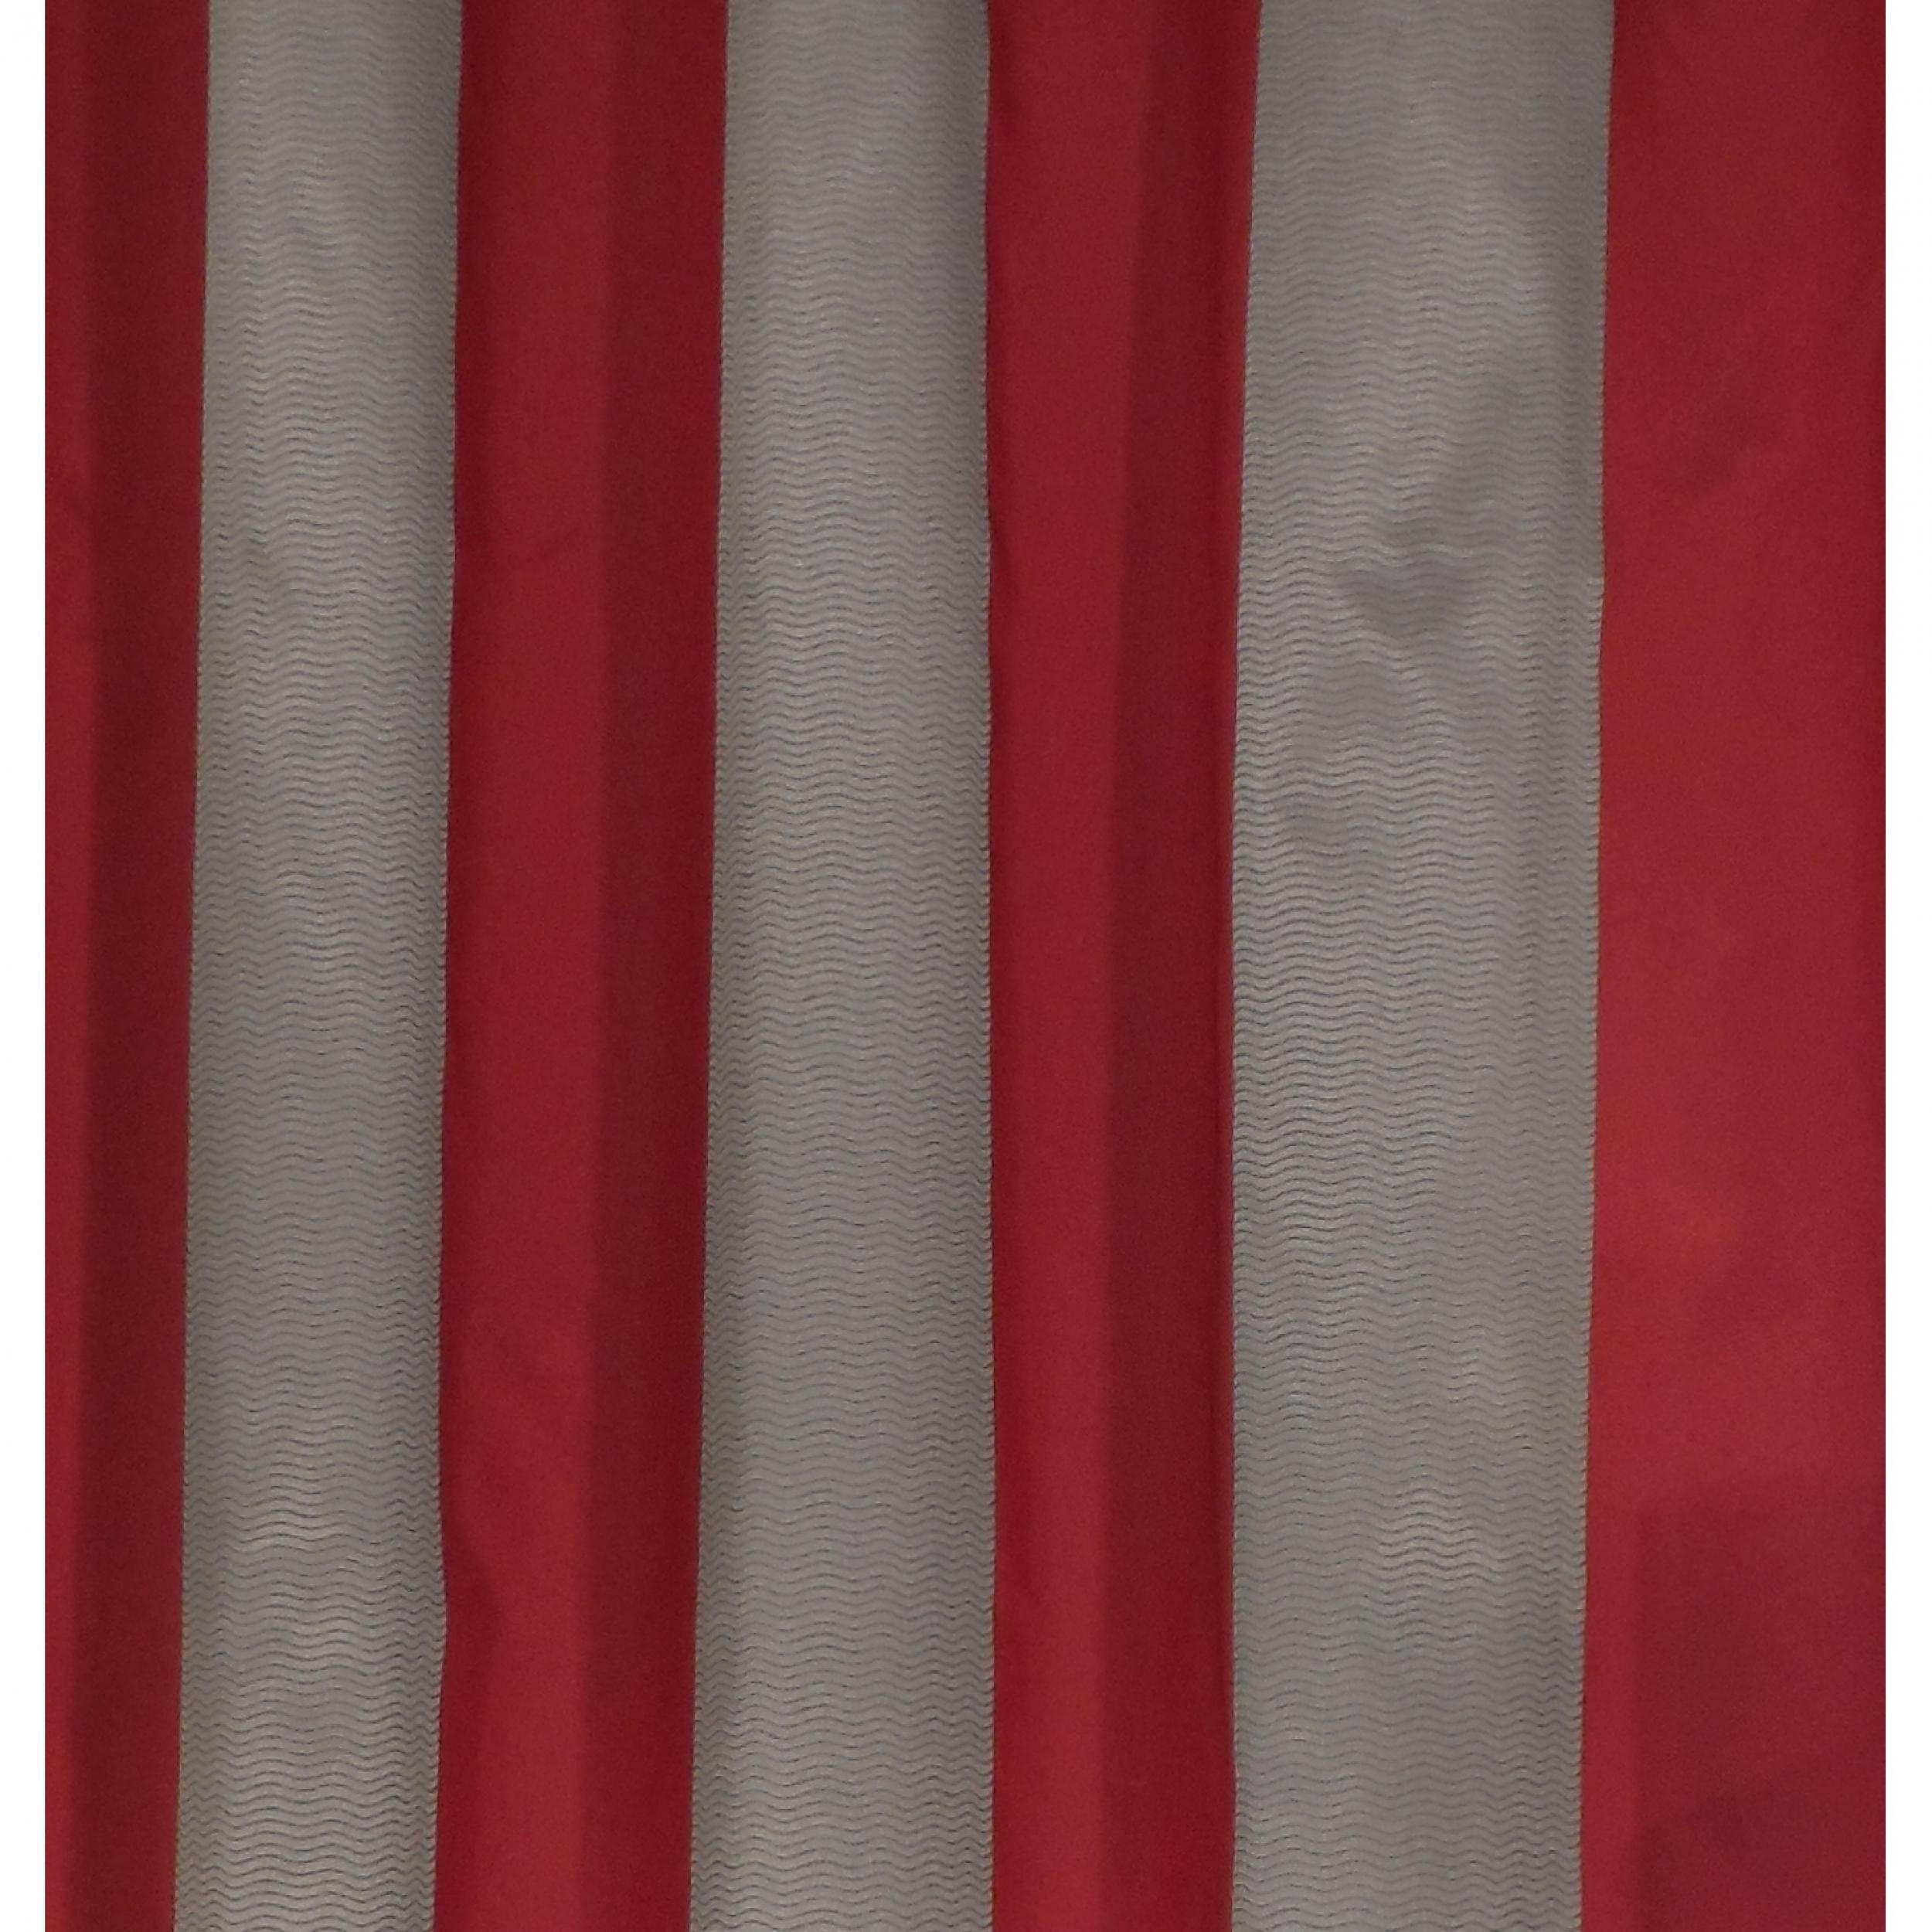 rideaux rouge gris. Black Bedroom Furniture Sets. Home Design Ideas